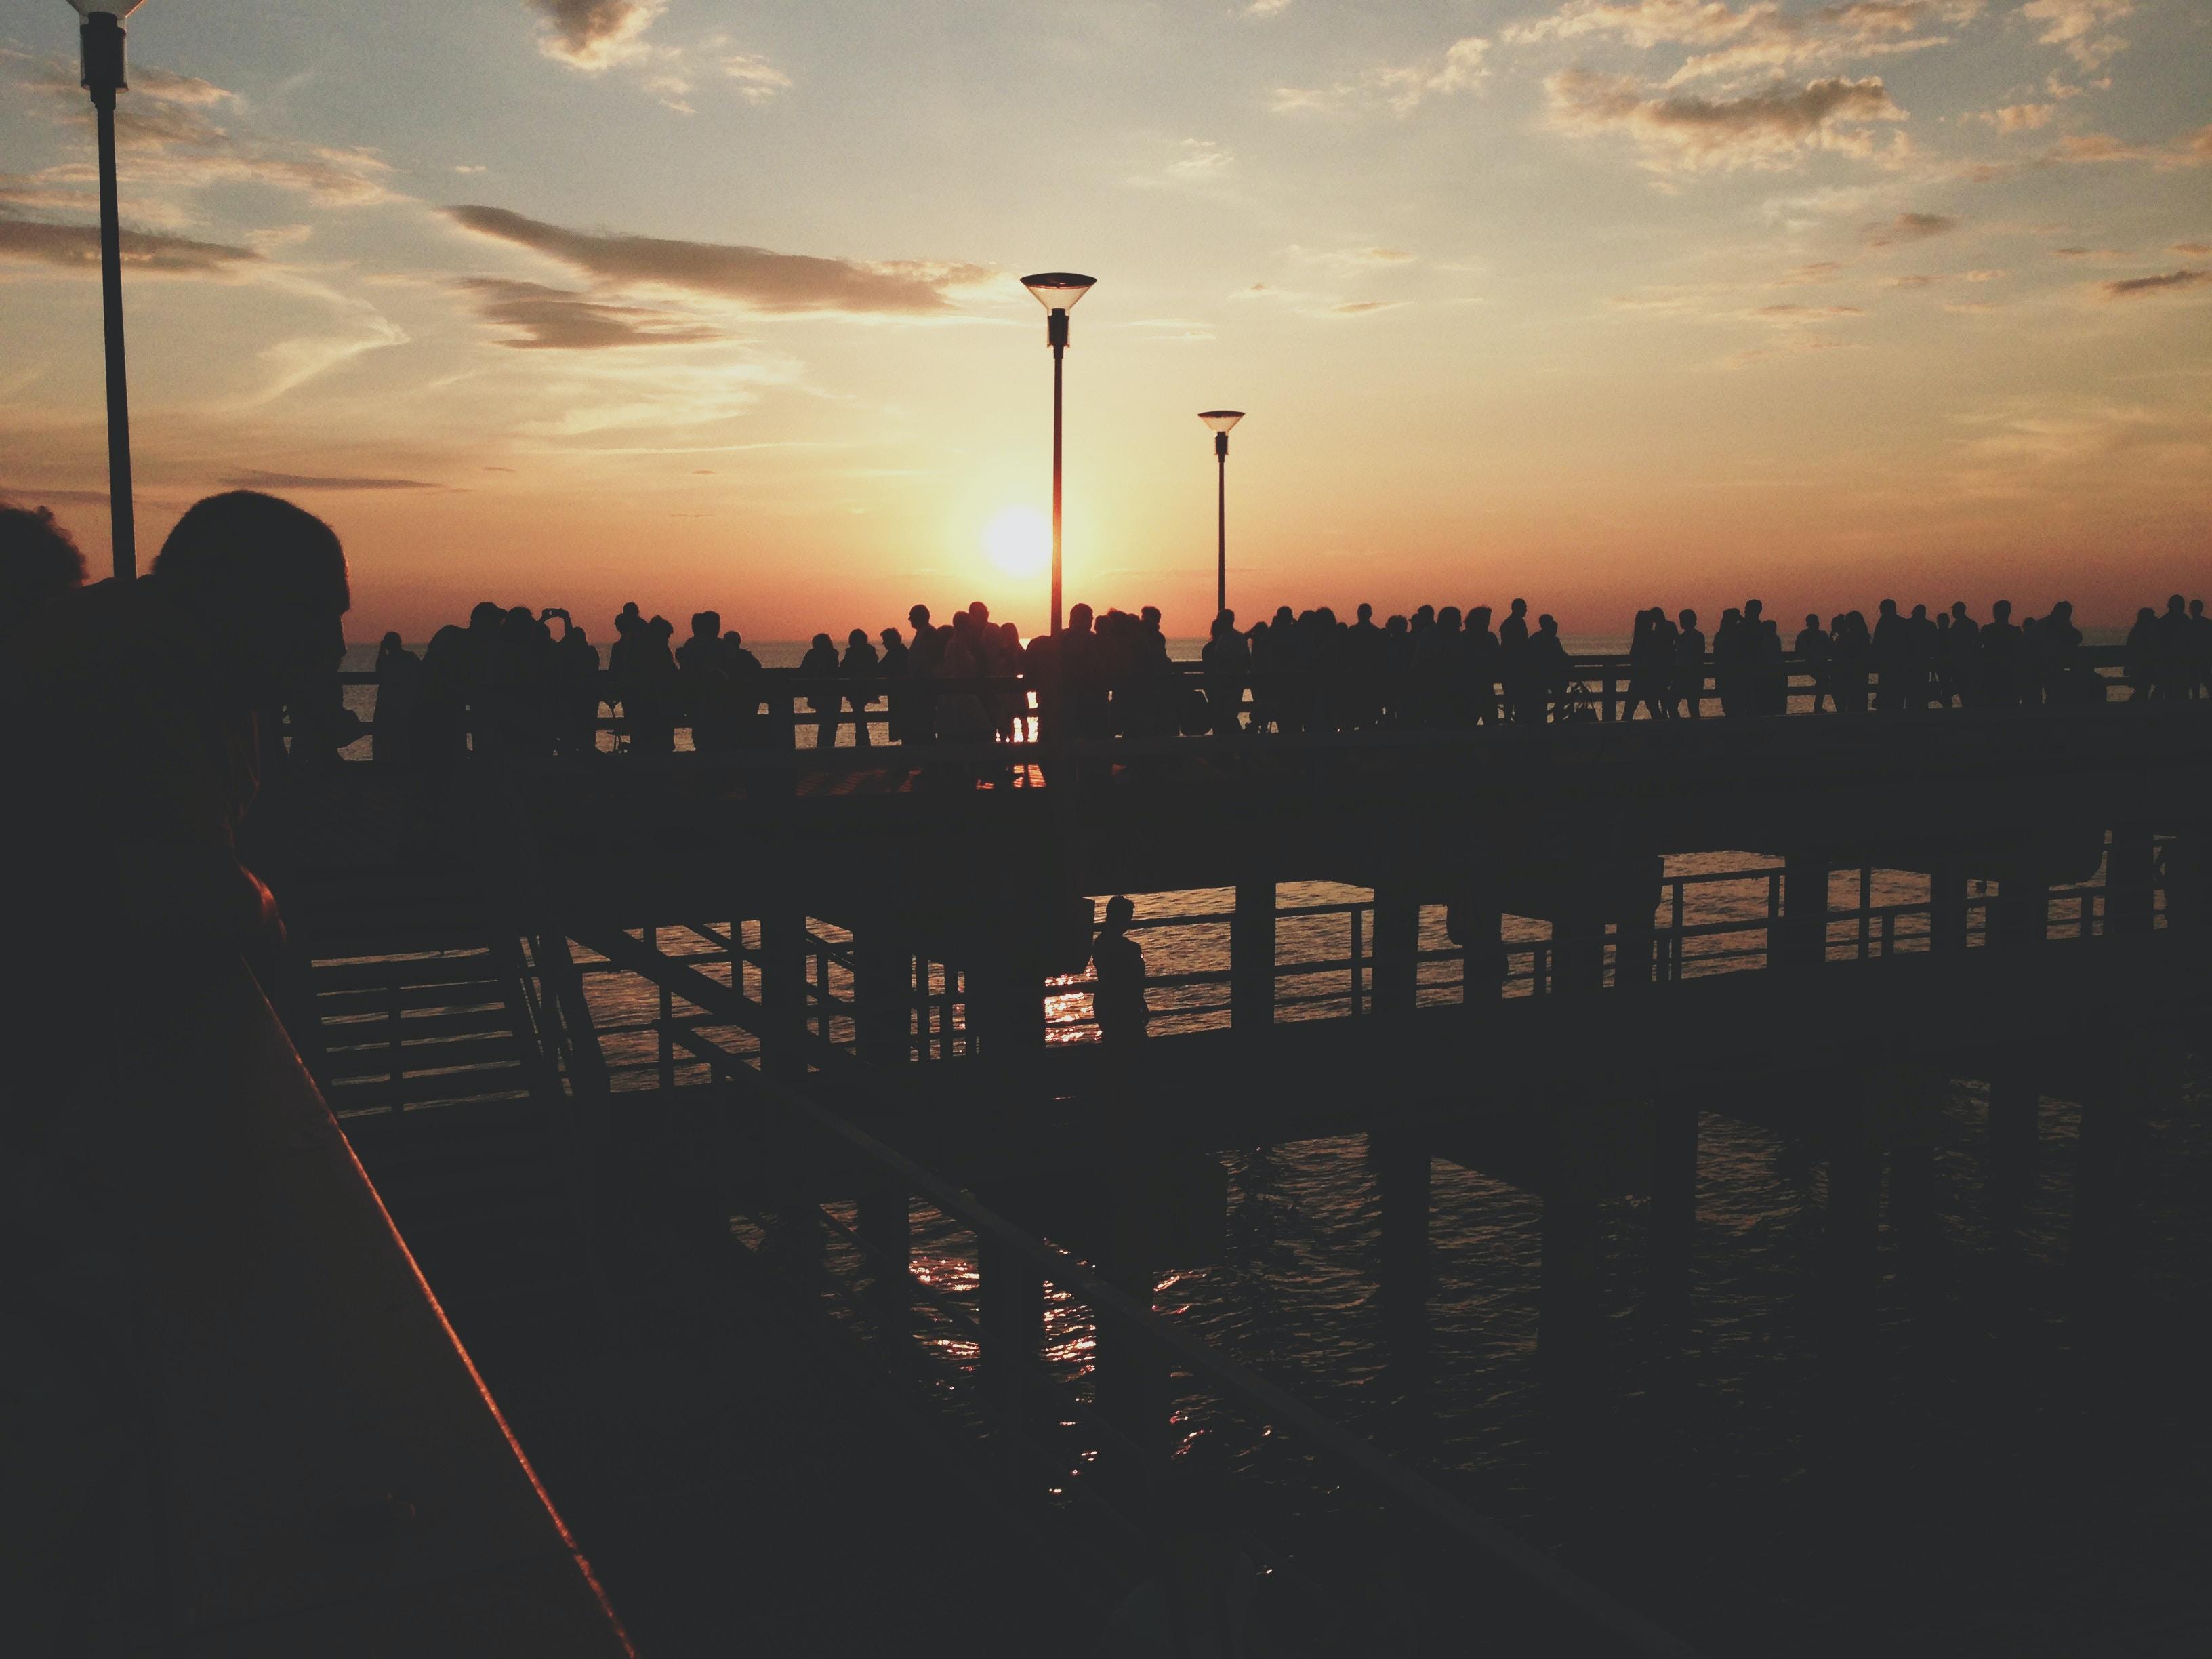 silhouette of people on bridge